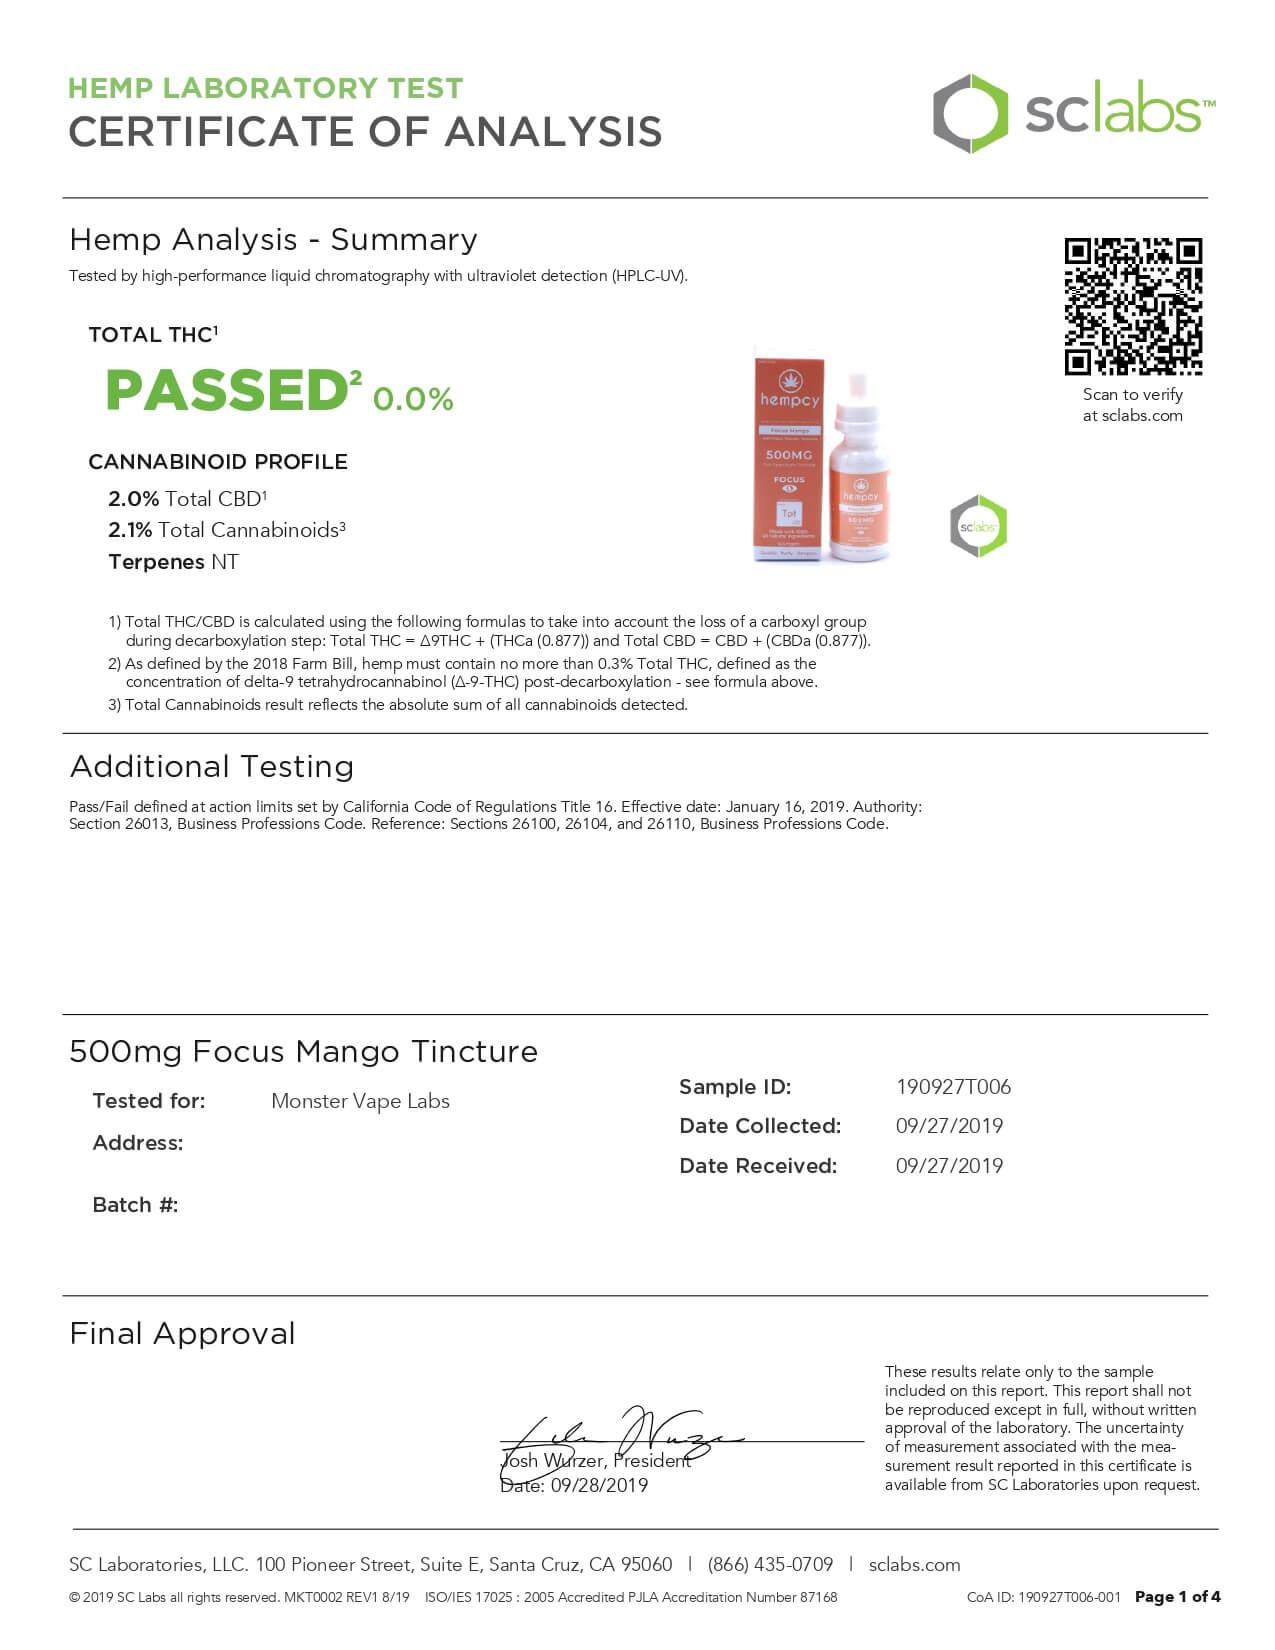 Hempcy CBD Edible Focus Mango 500mg Lab Report